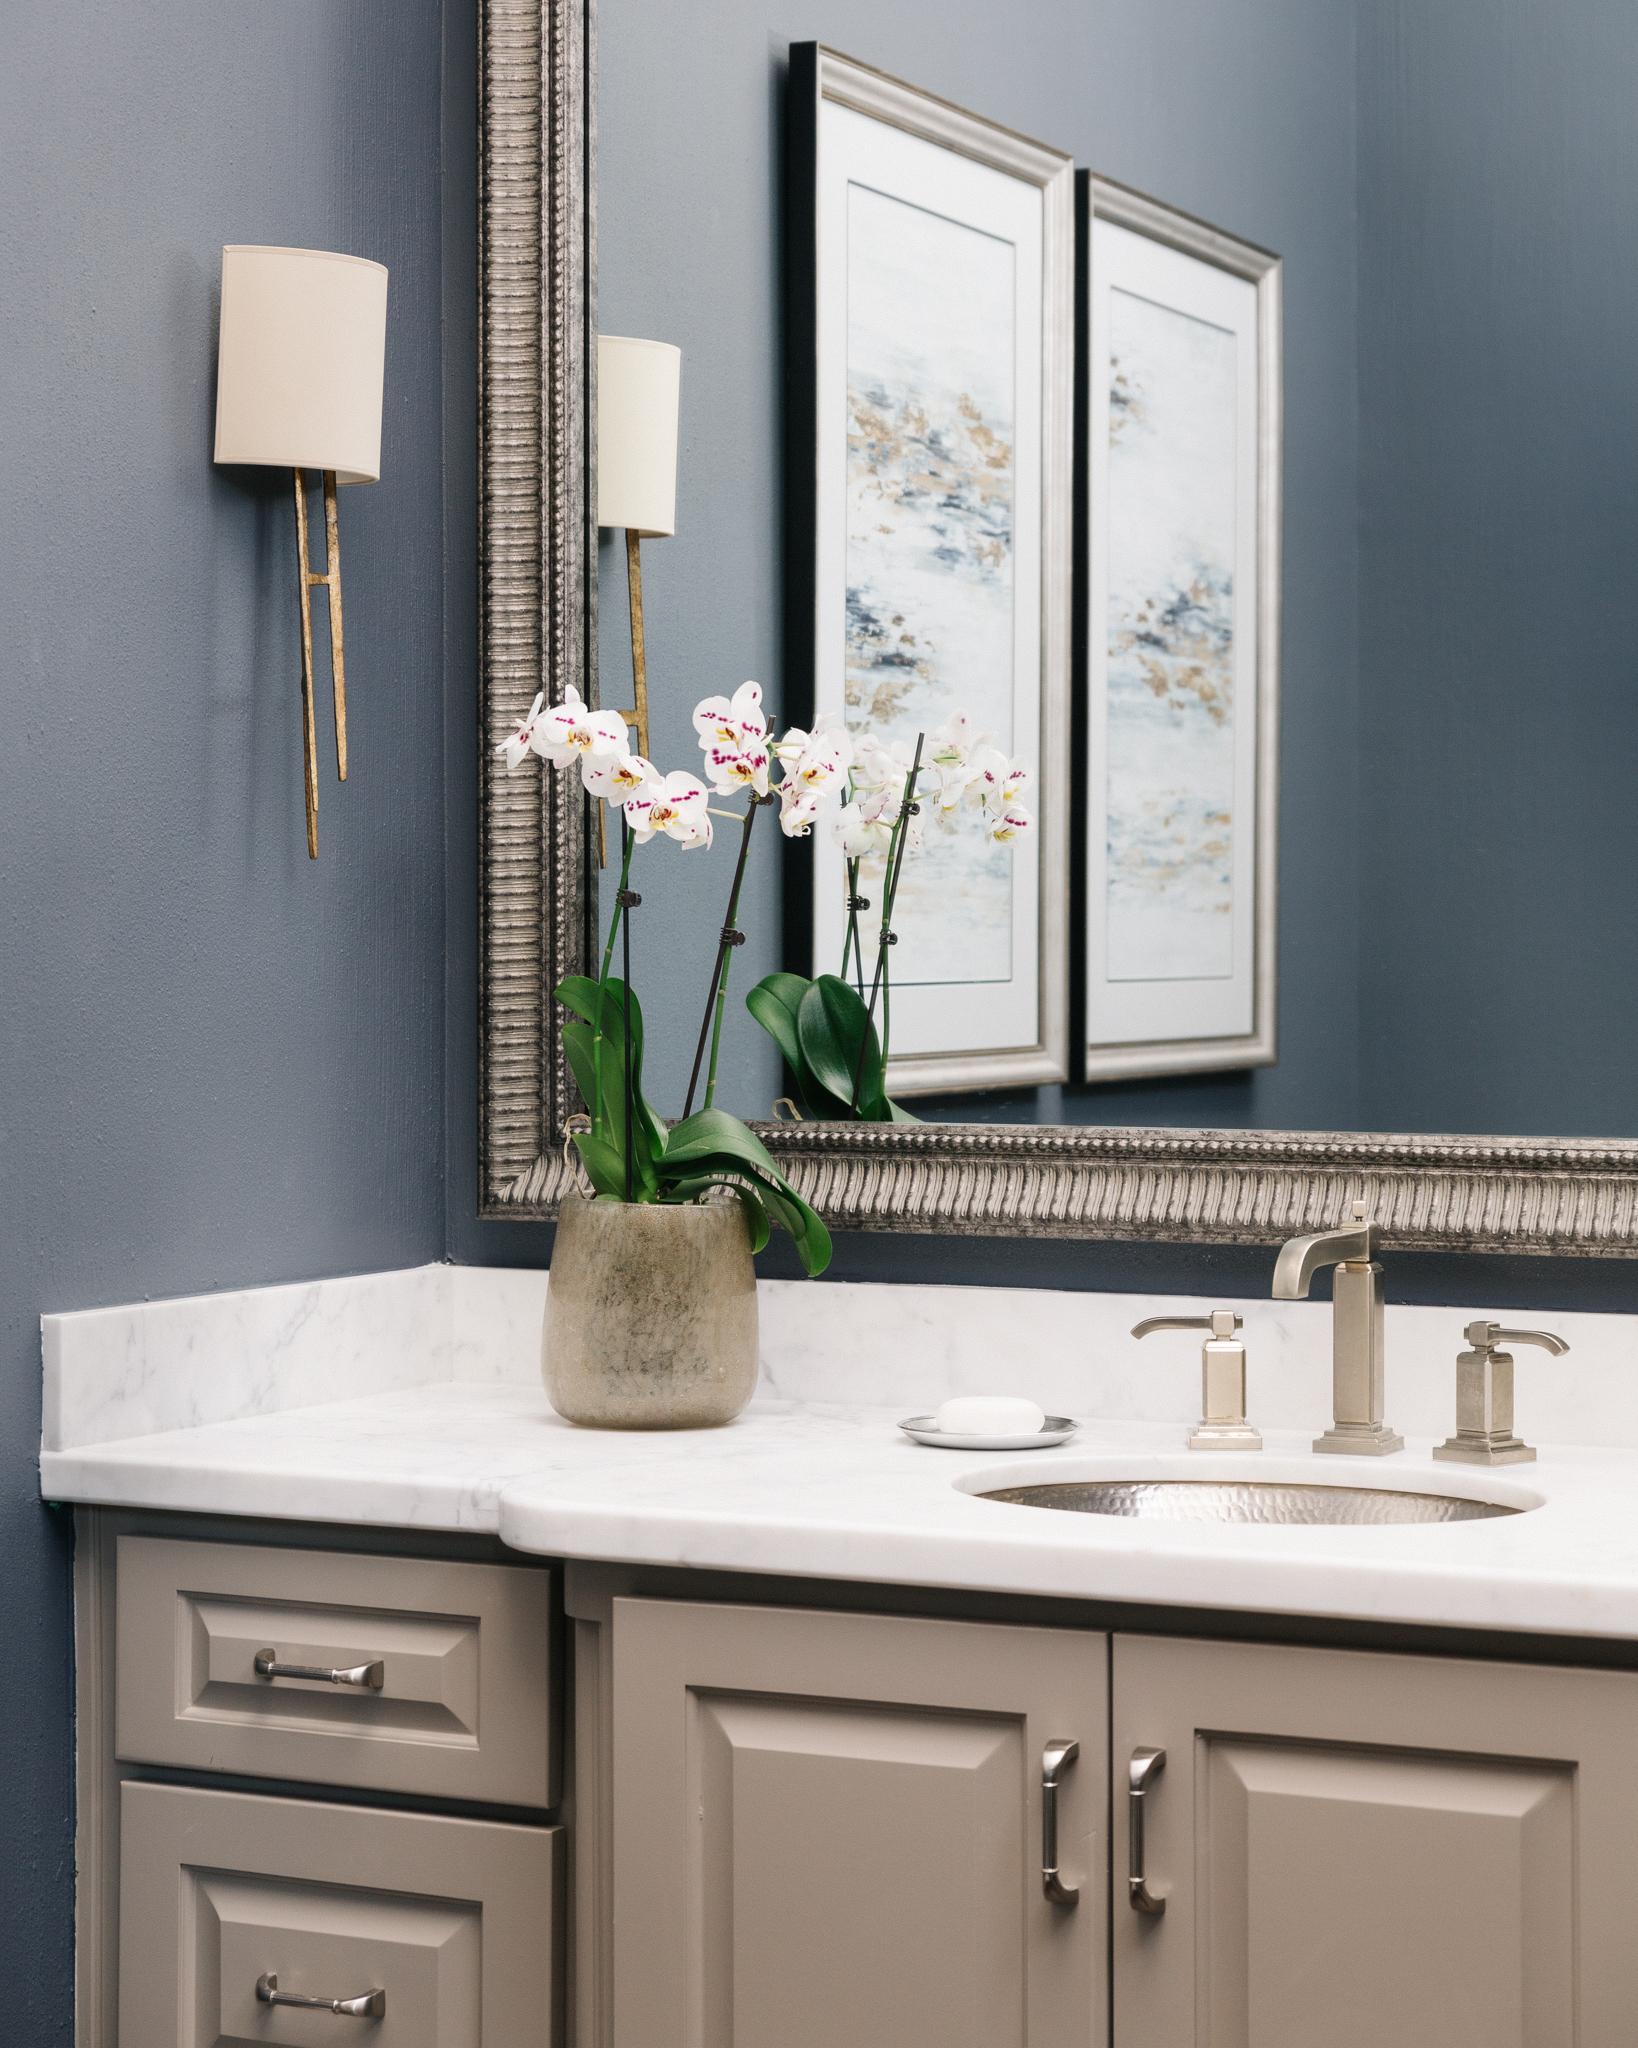 A beautiful powder room with wall sconces on the side walls of the vanity. Carla Aston, Designer | Colleen Scott, Photographer #wallsconces #vanitylight #bathroomlighting #bathroomdesign